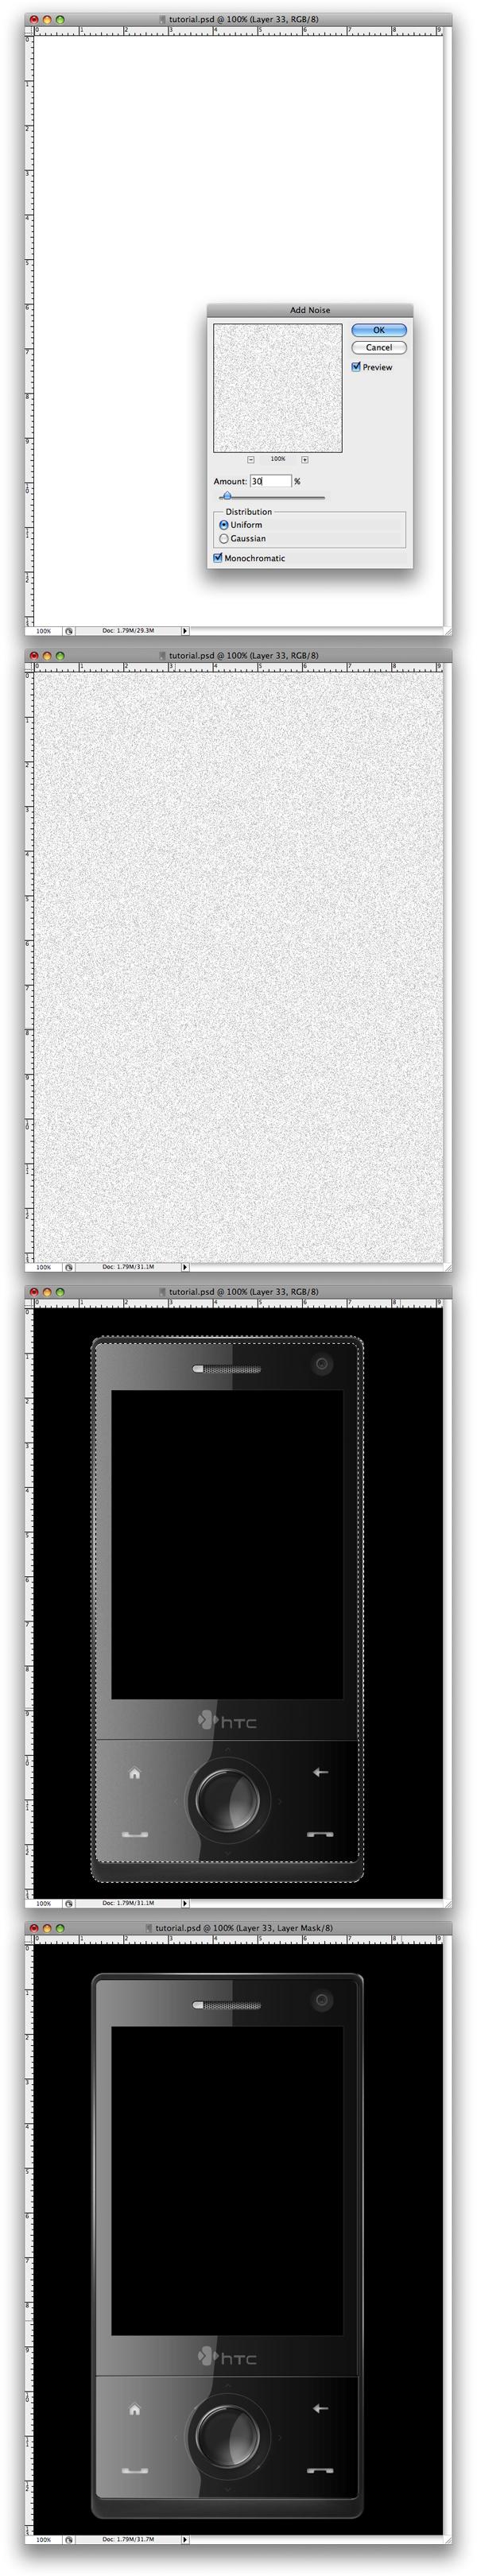 [Tutorial] Celular HTC Touch Diamond 49